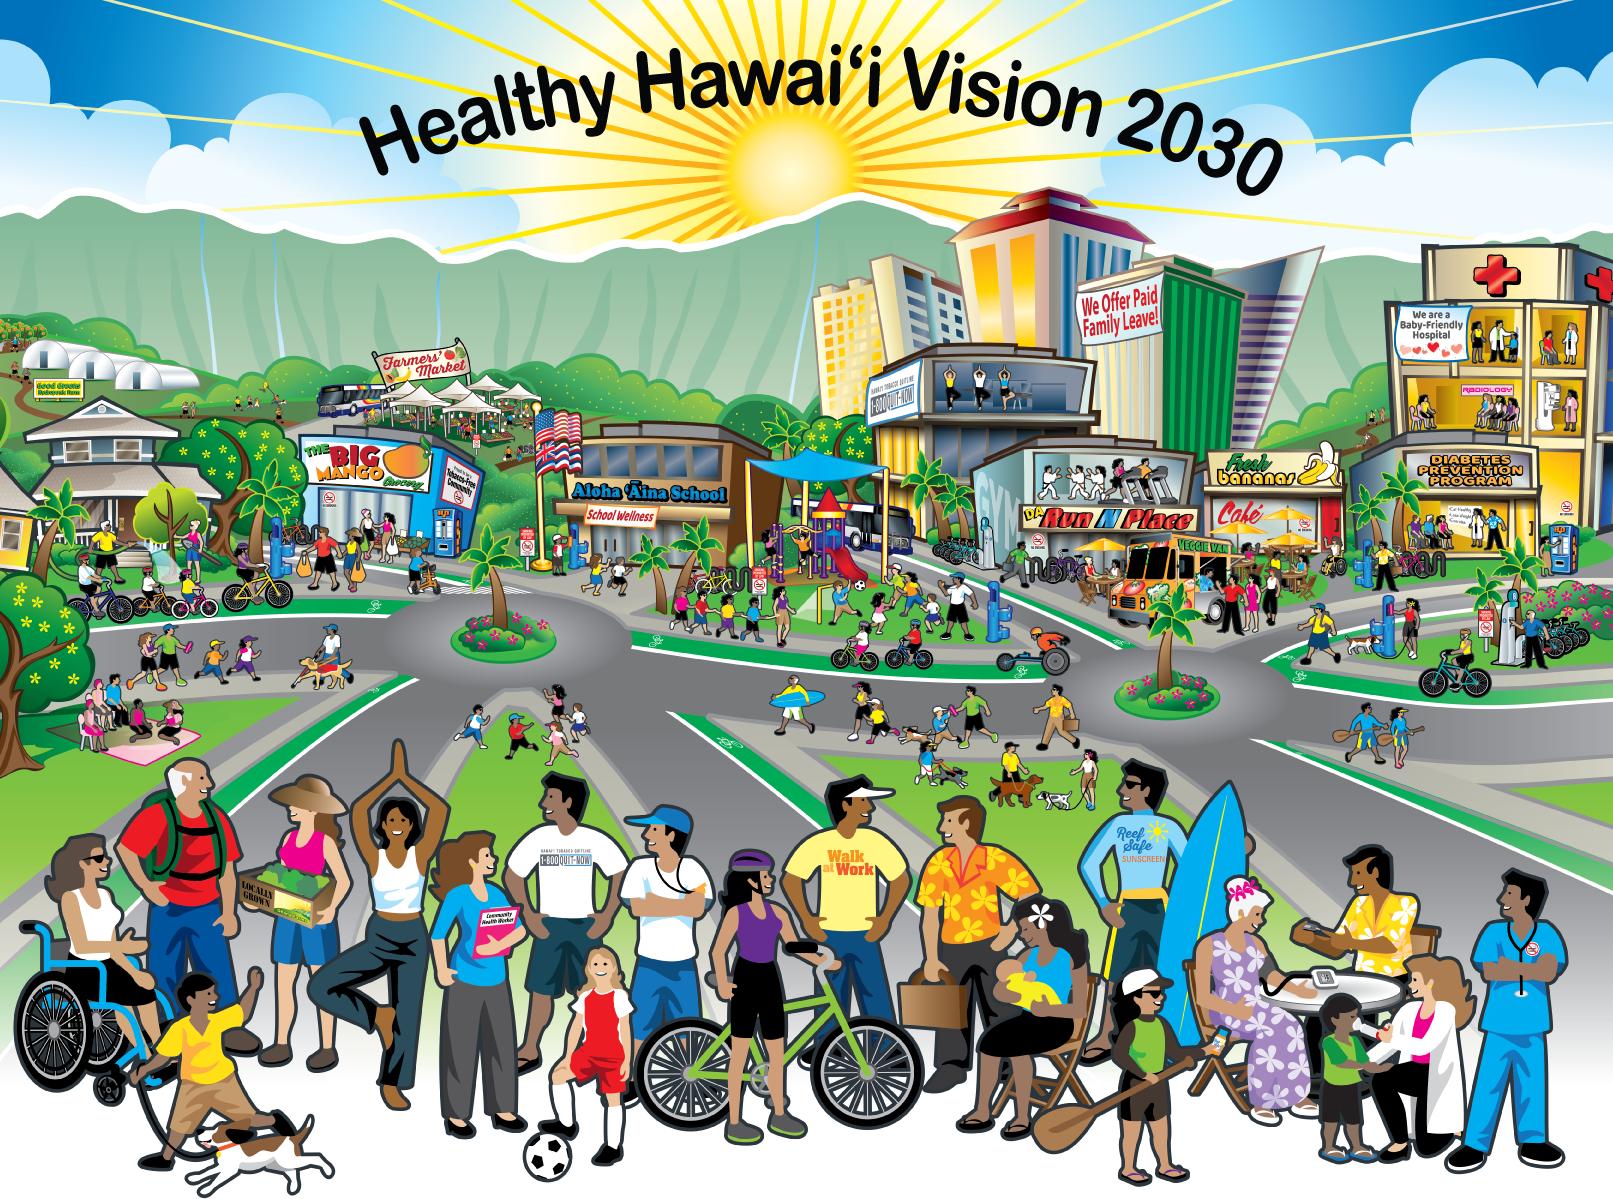 Healthy Hawaii Vision 2030